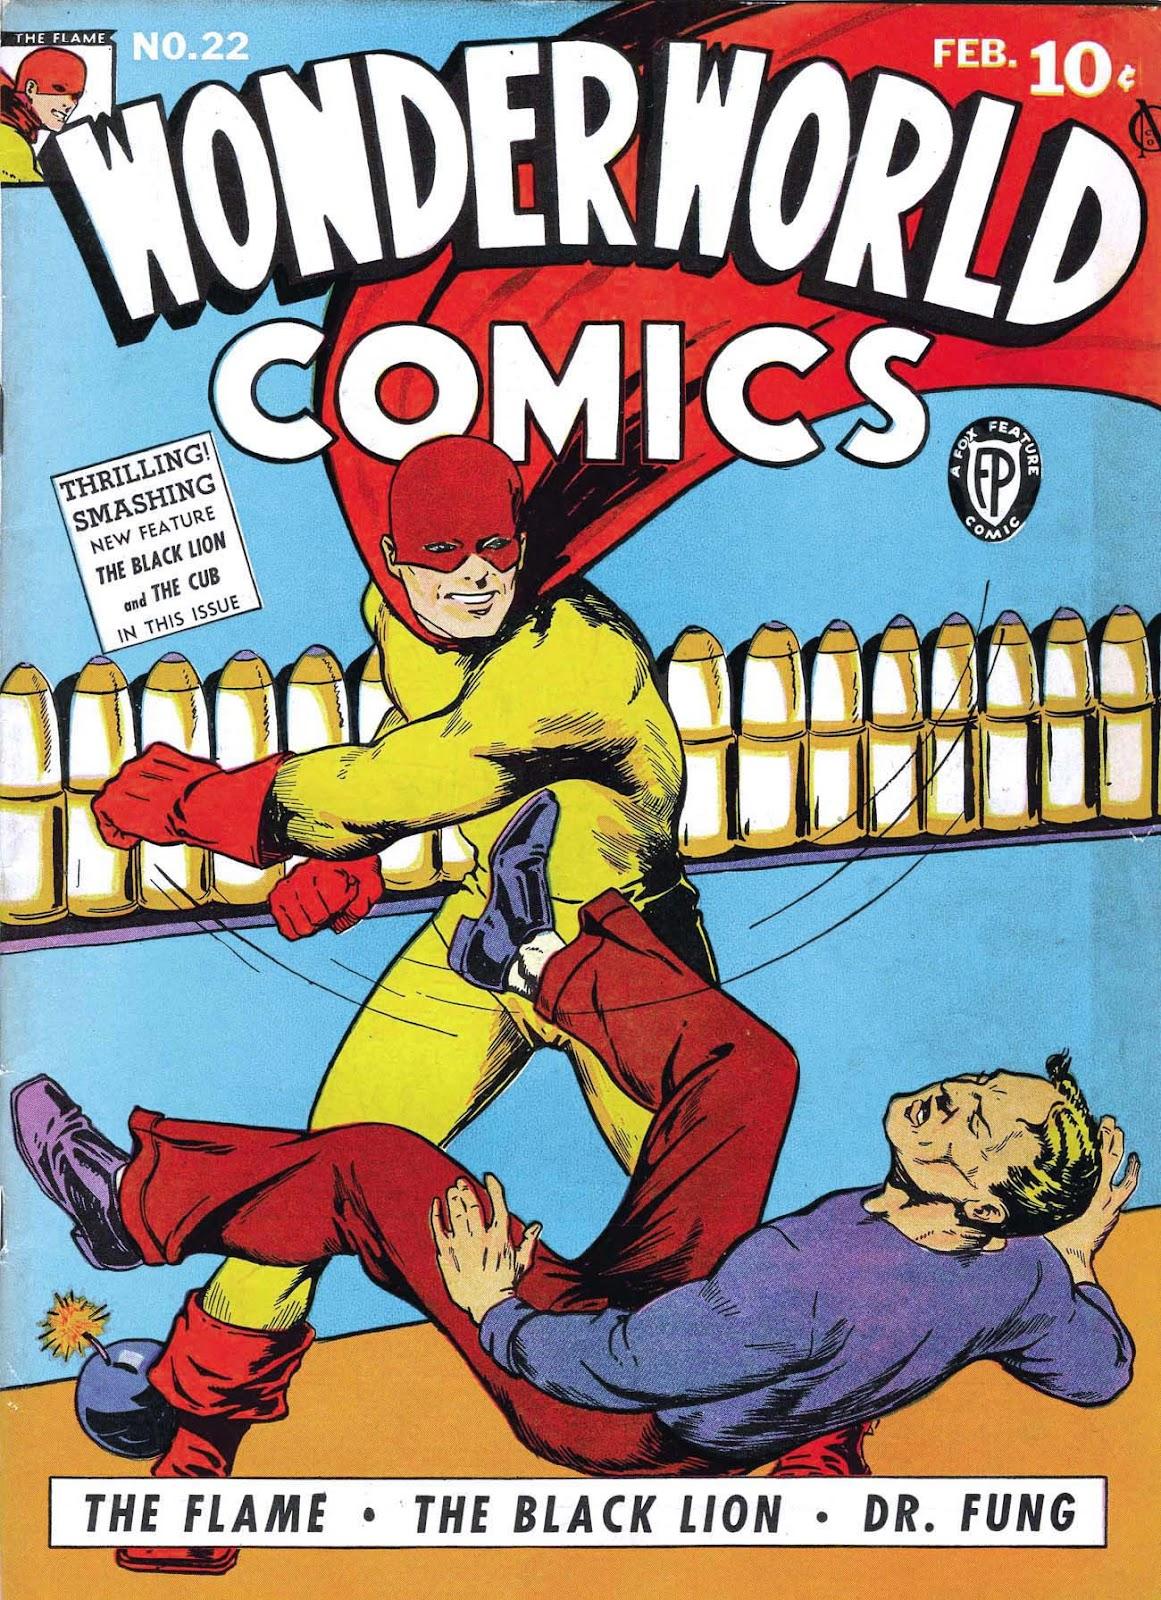 Wonderworld Comics issue 22 - Page 1